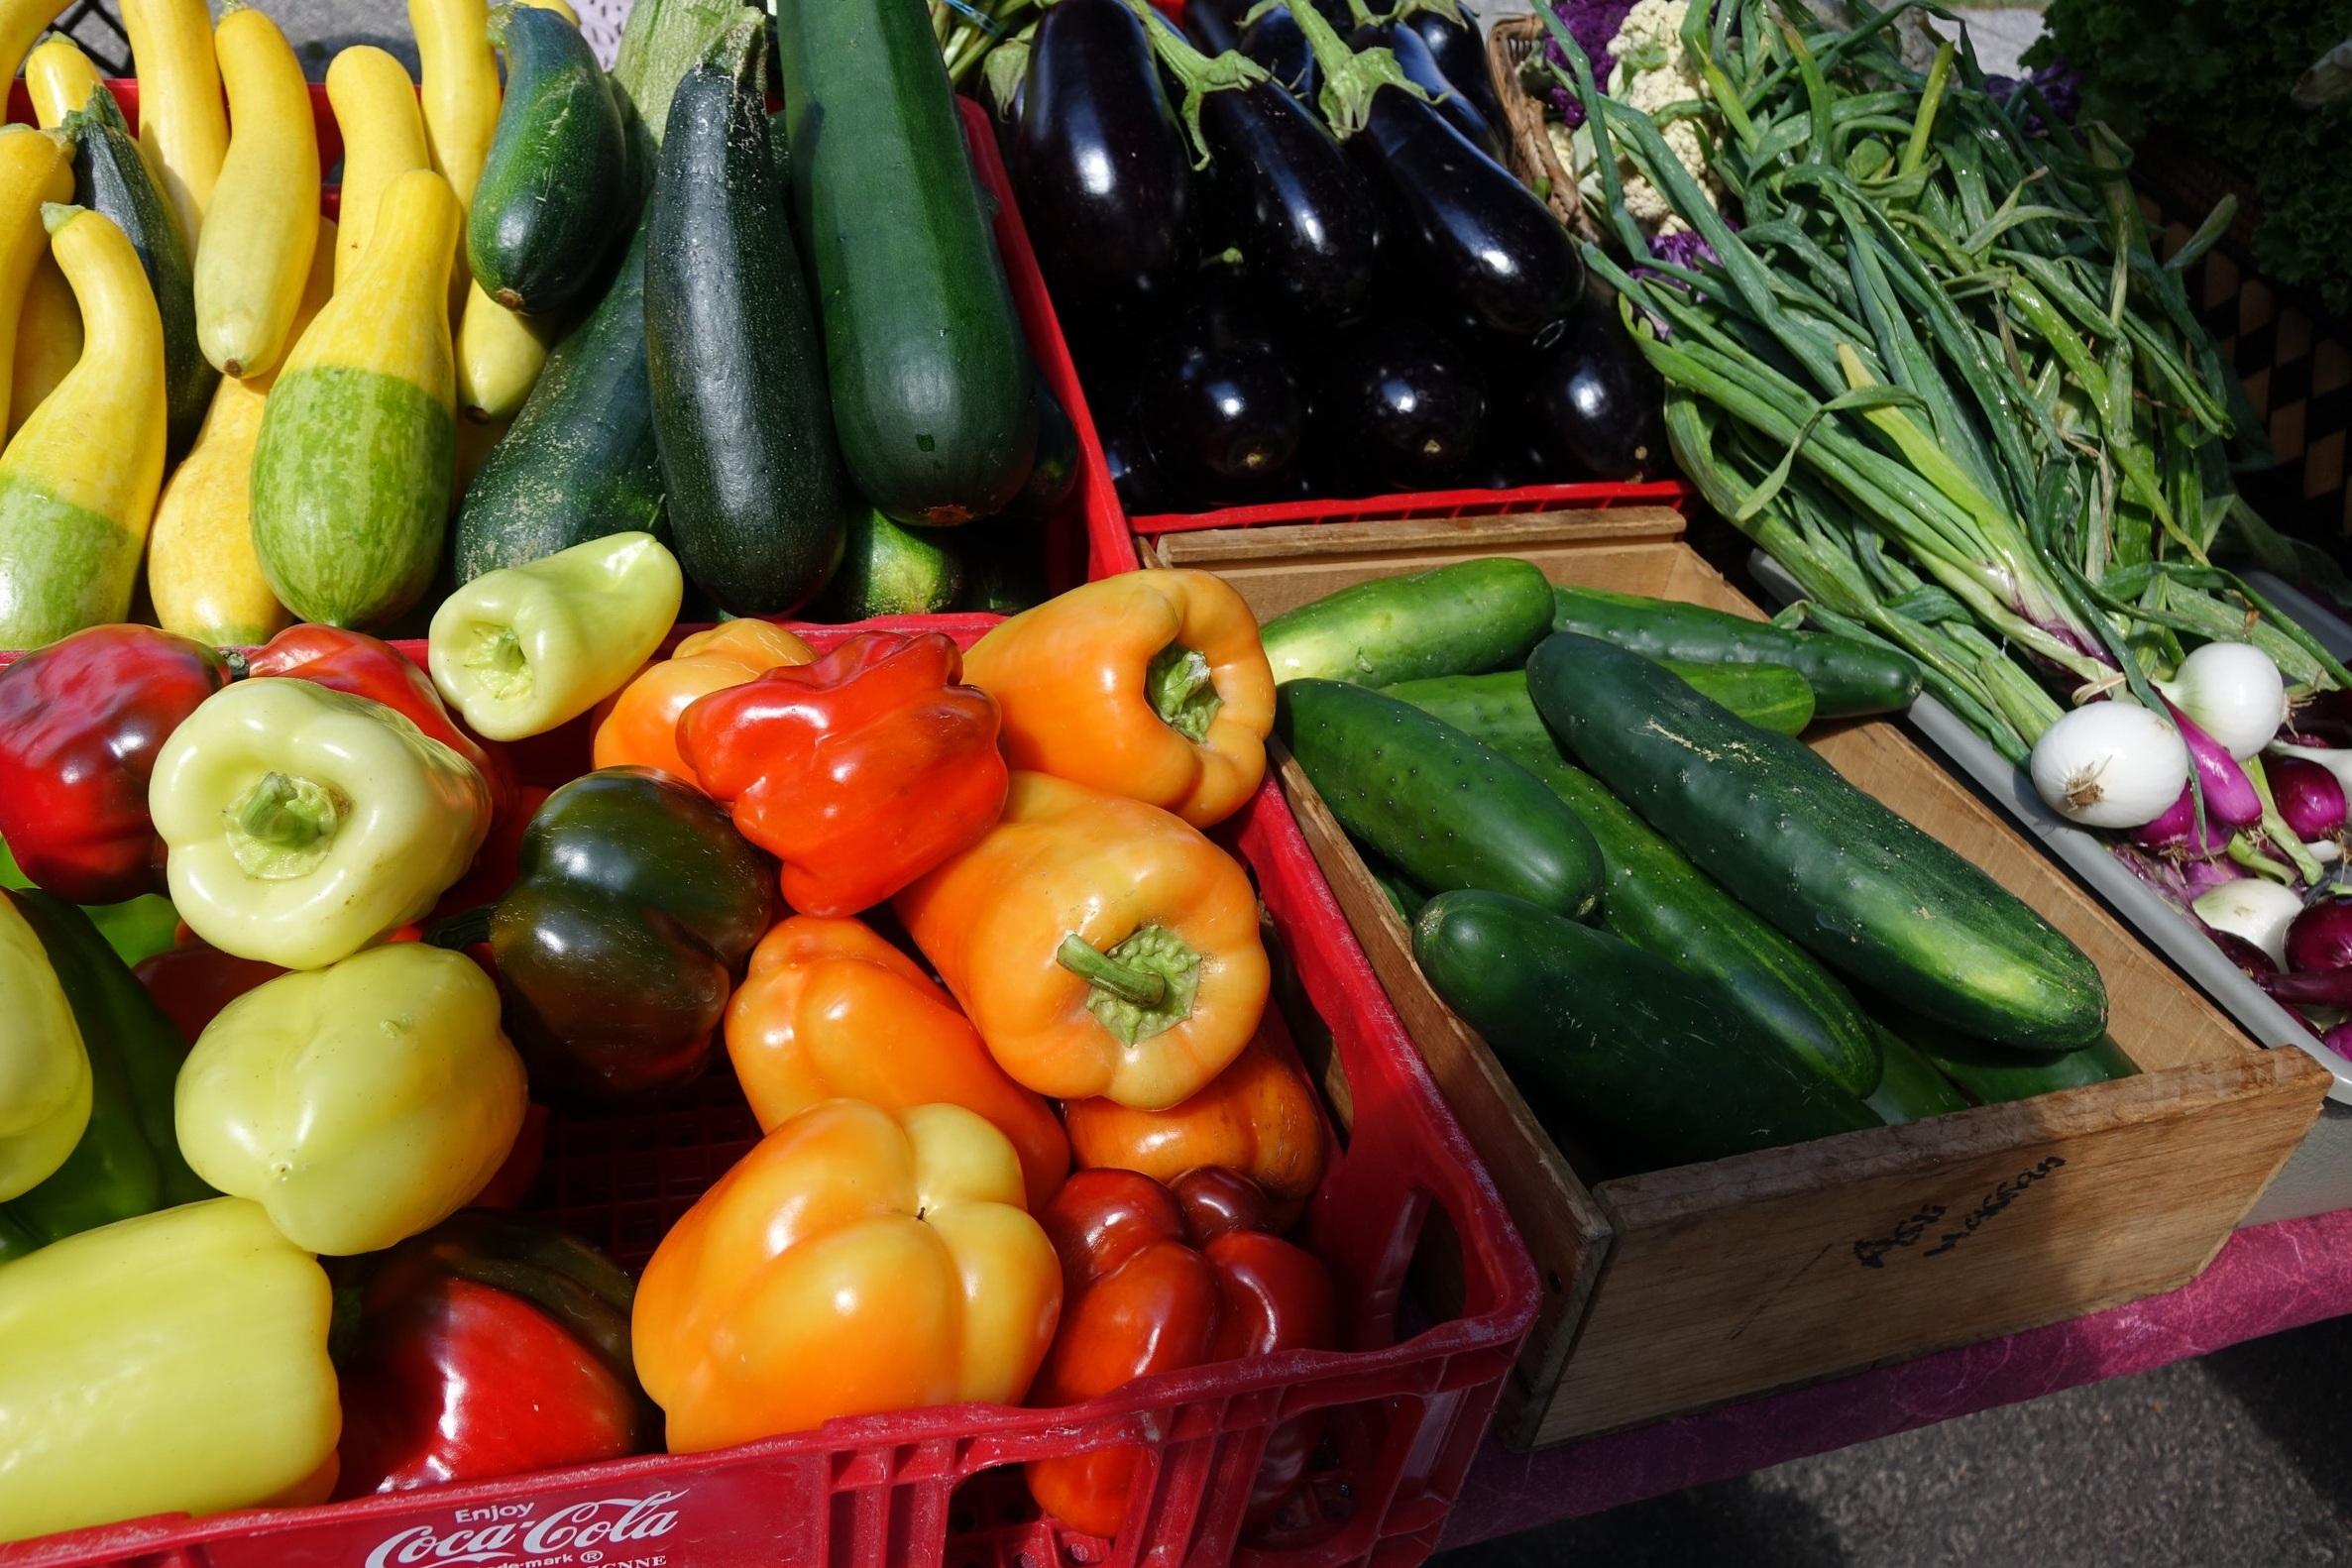 Wholesale - Fresh locally-grown produce